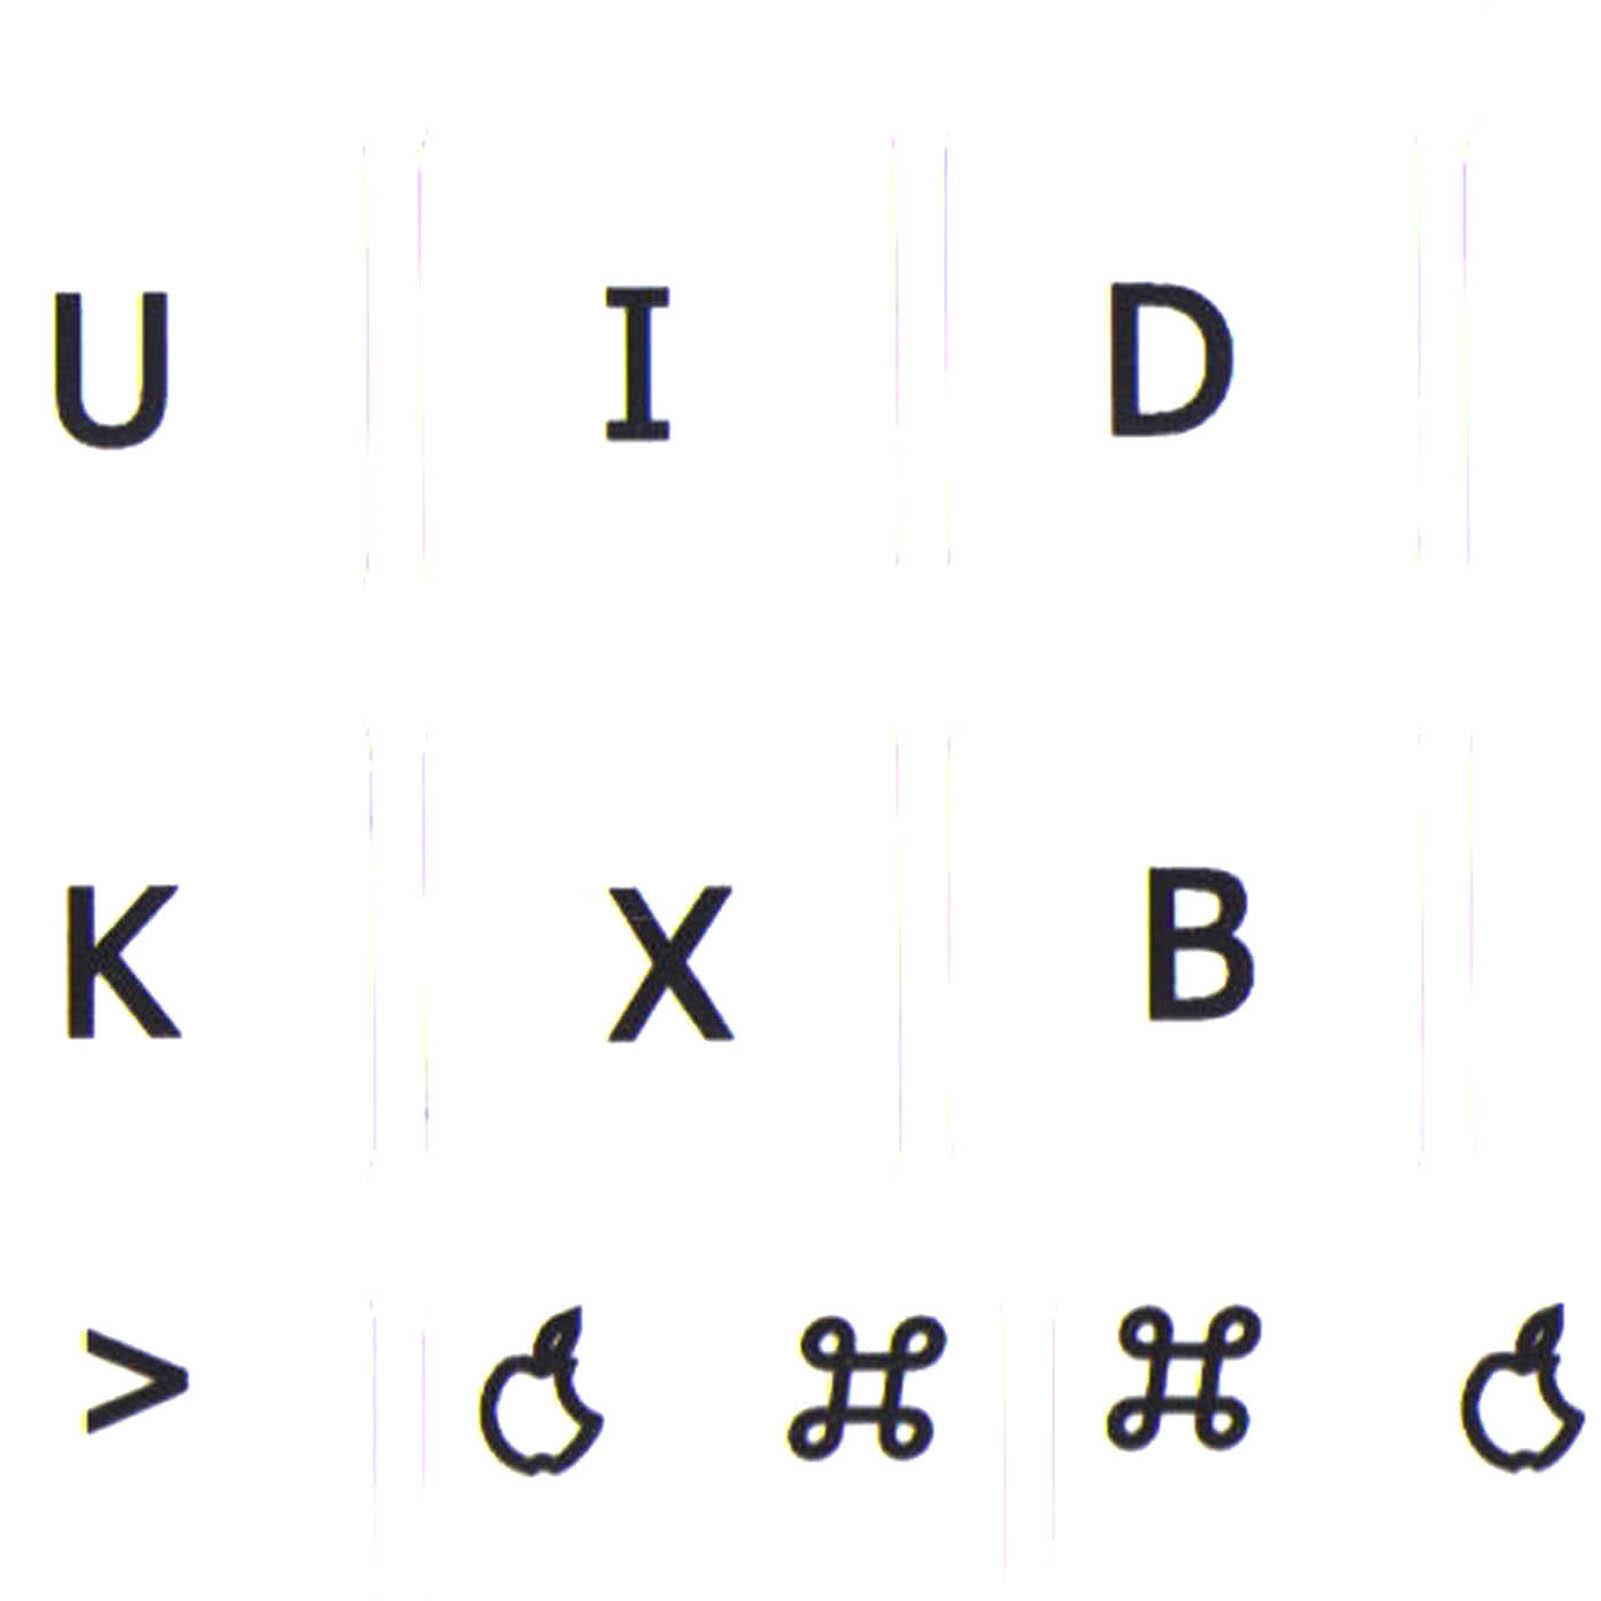 mac Dvorak keyboard stickers white